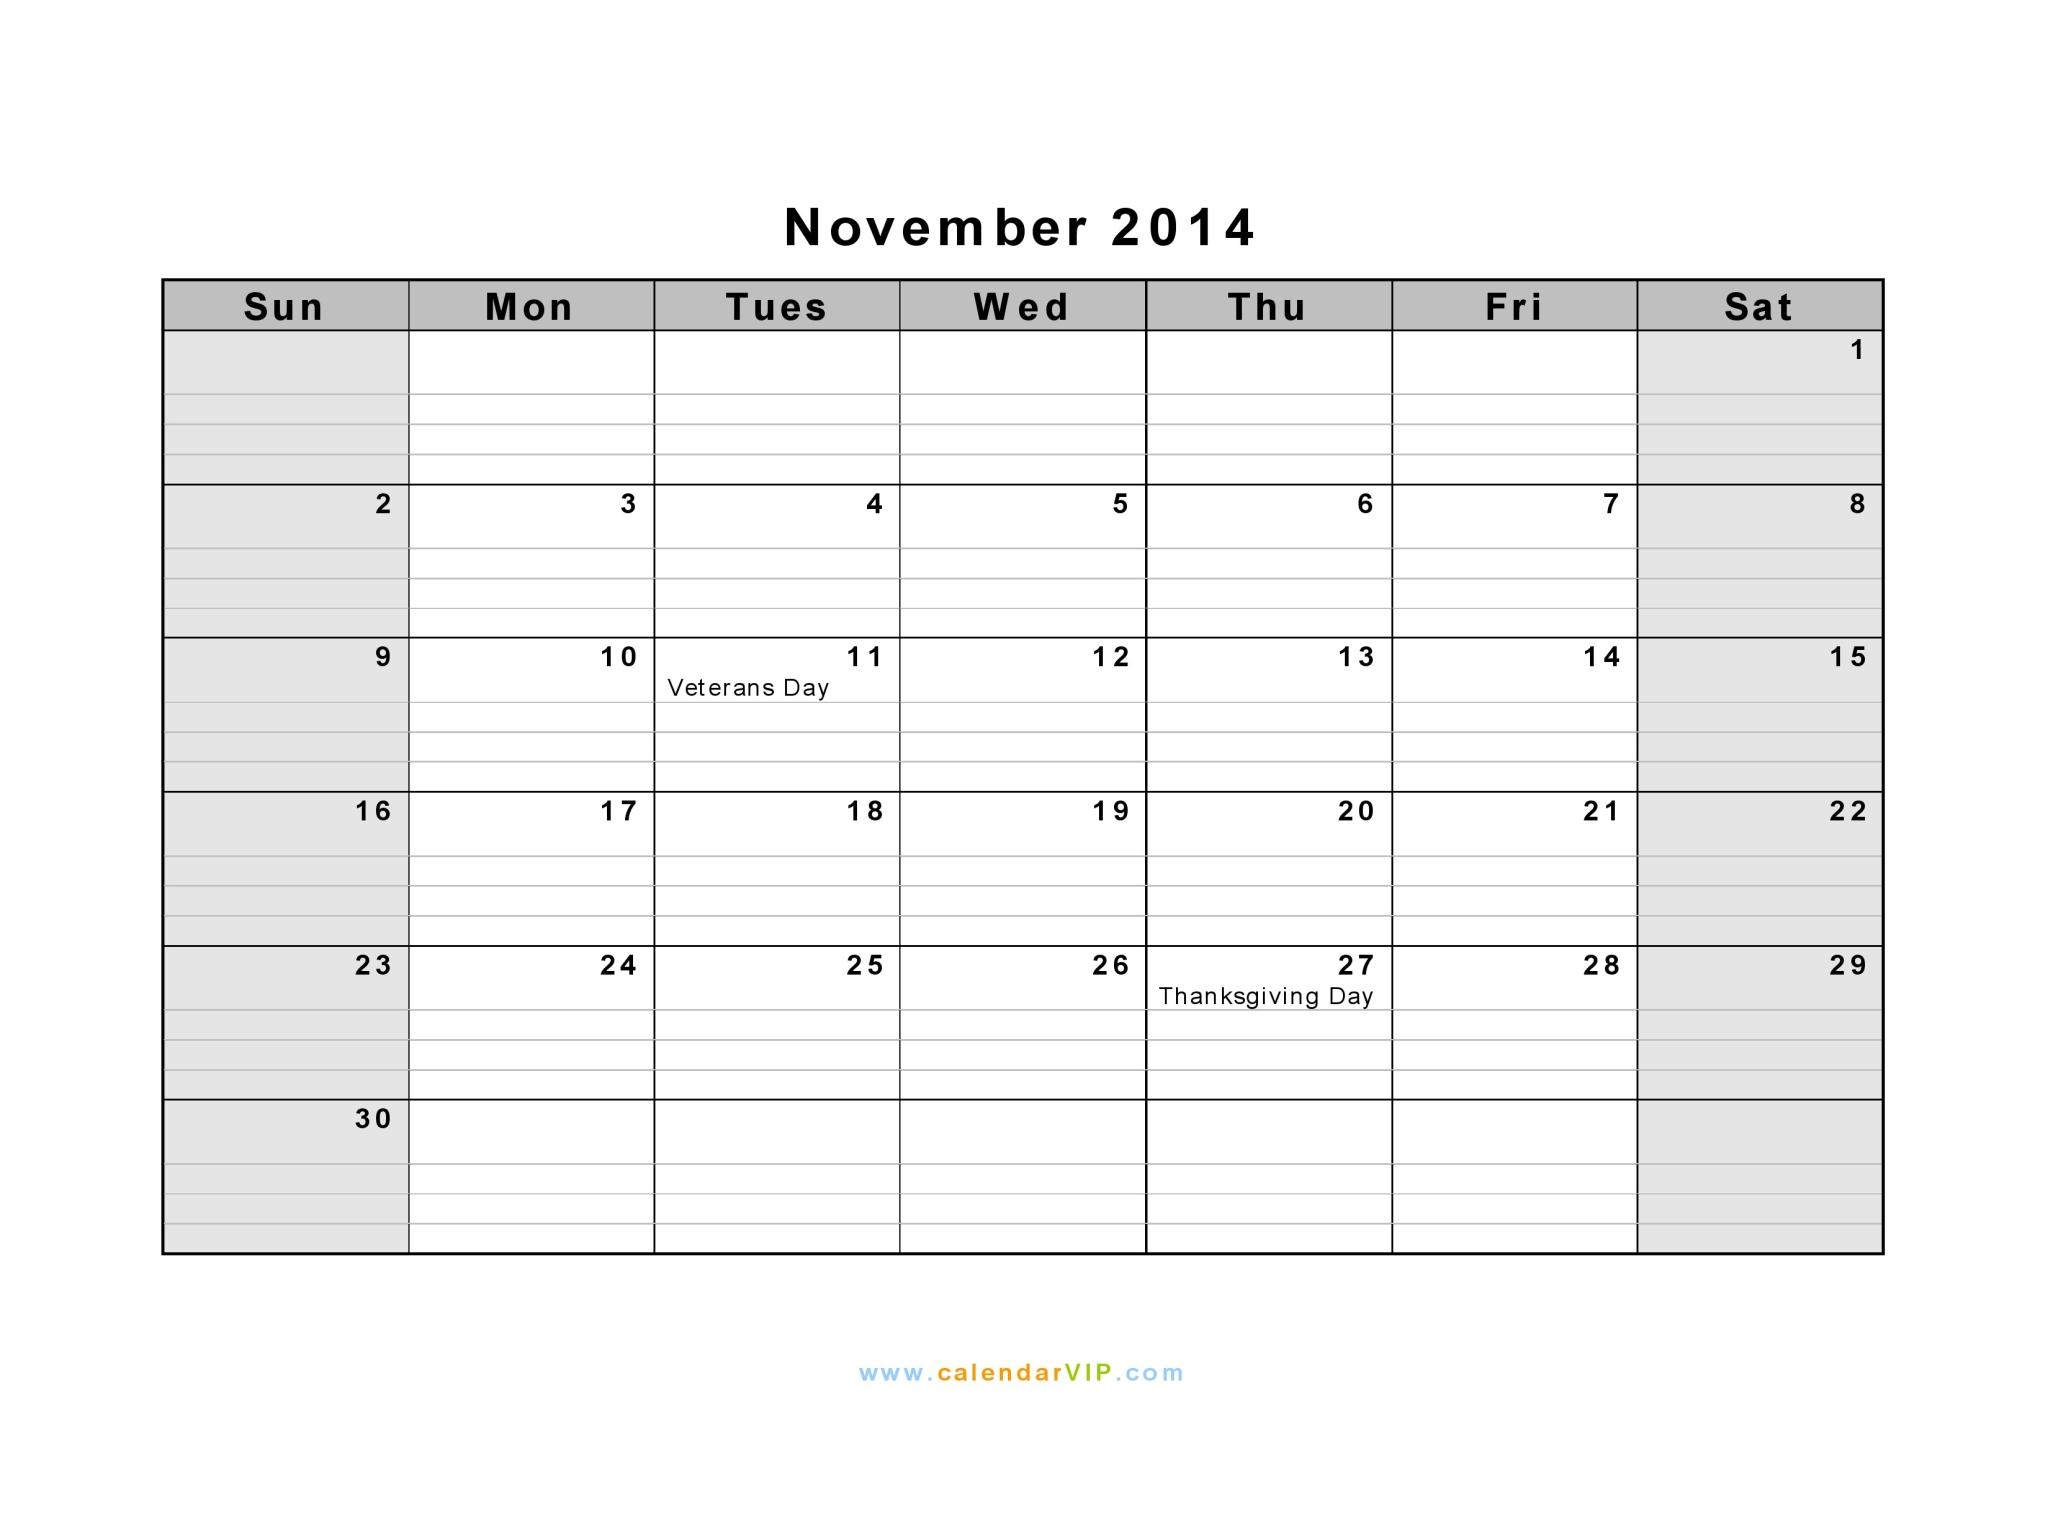 November 2014 Calendar Blank Printable Calendar Template In Pdf